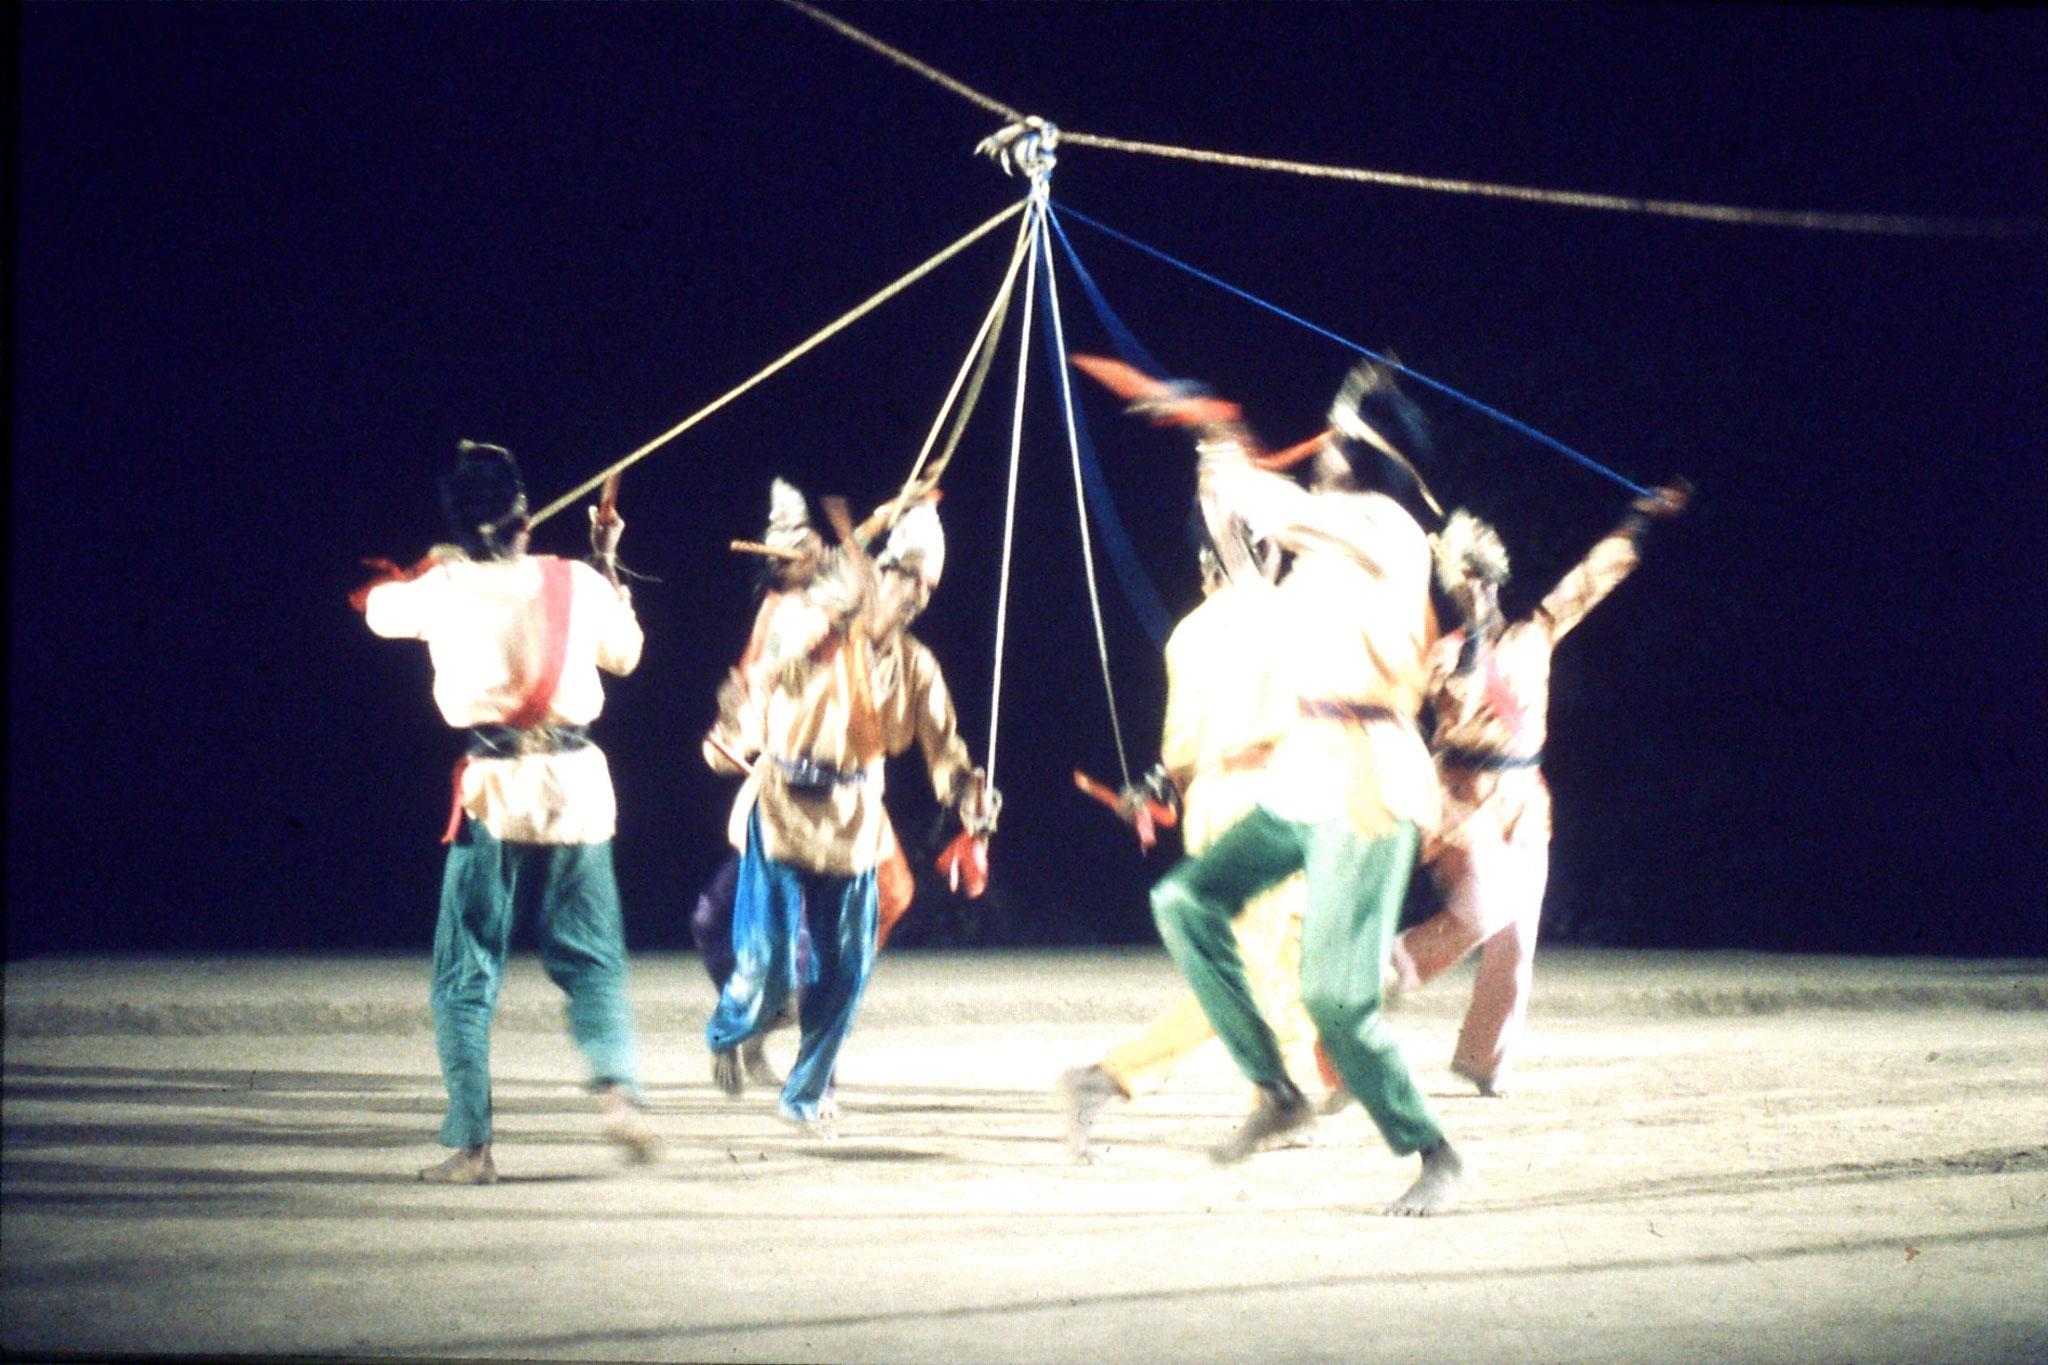 8/12/1989: 32: Udaipur Shilp Gram Craft Centre dancing